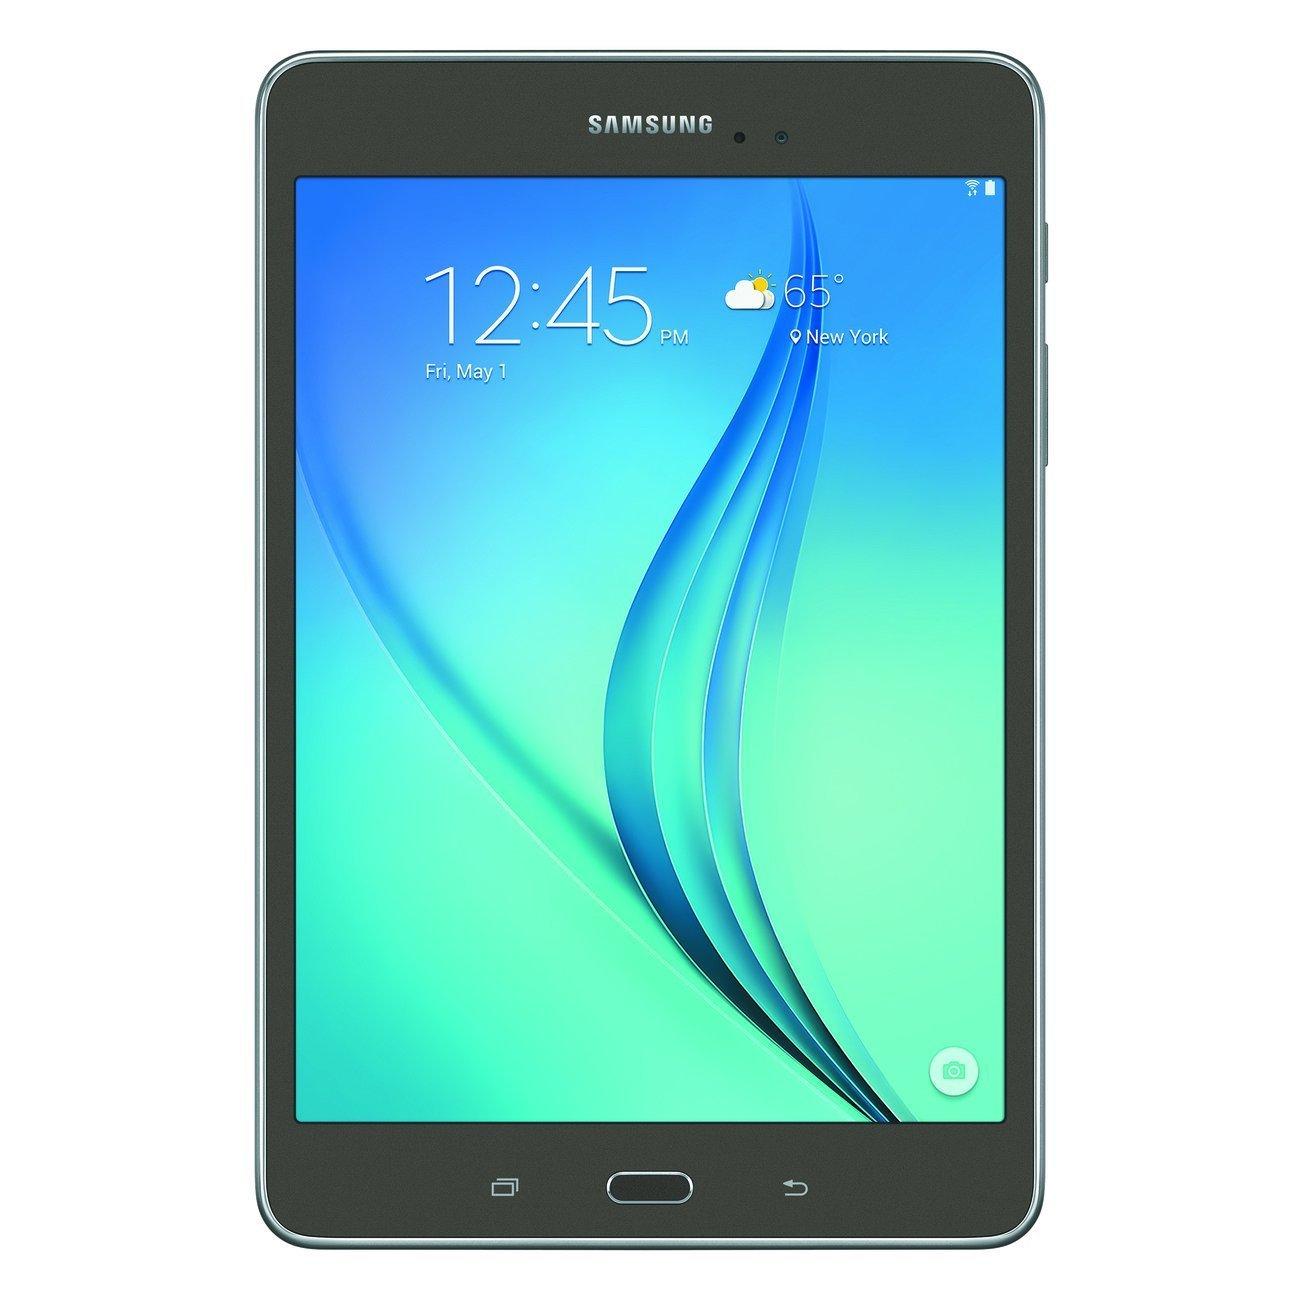 Samsung Galaxy Tab A 8''; 16 GB Wifi Tablet (Smoky Titanium) SM-T350NZAAXAR